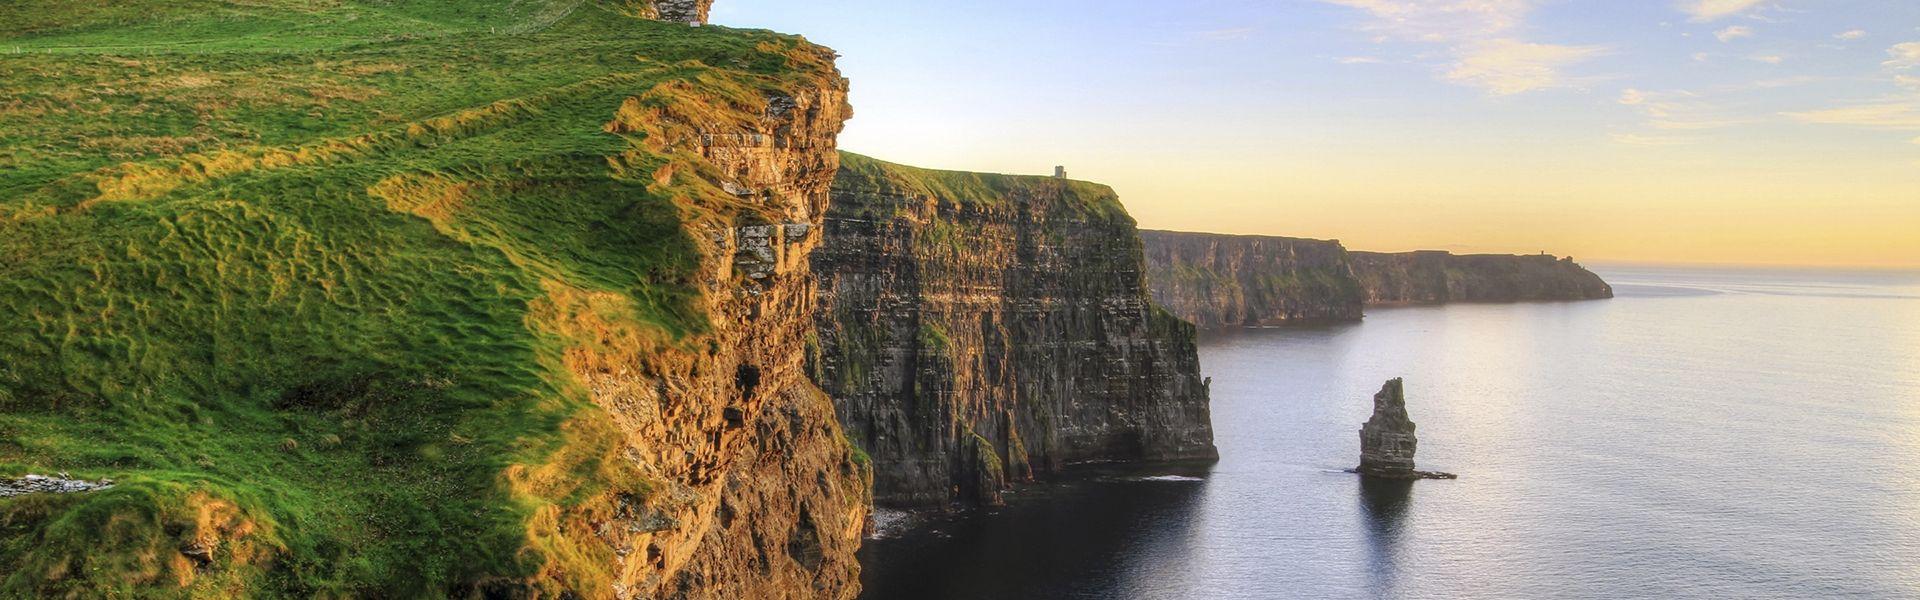 Gran tour d'Irlanda